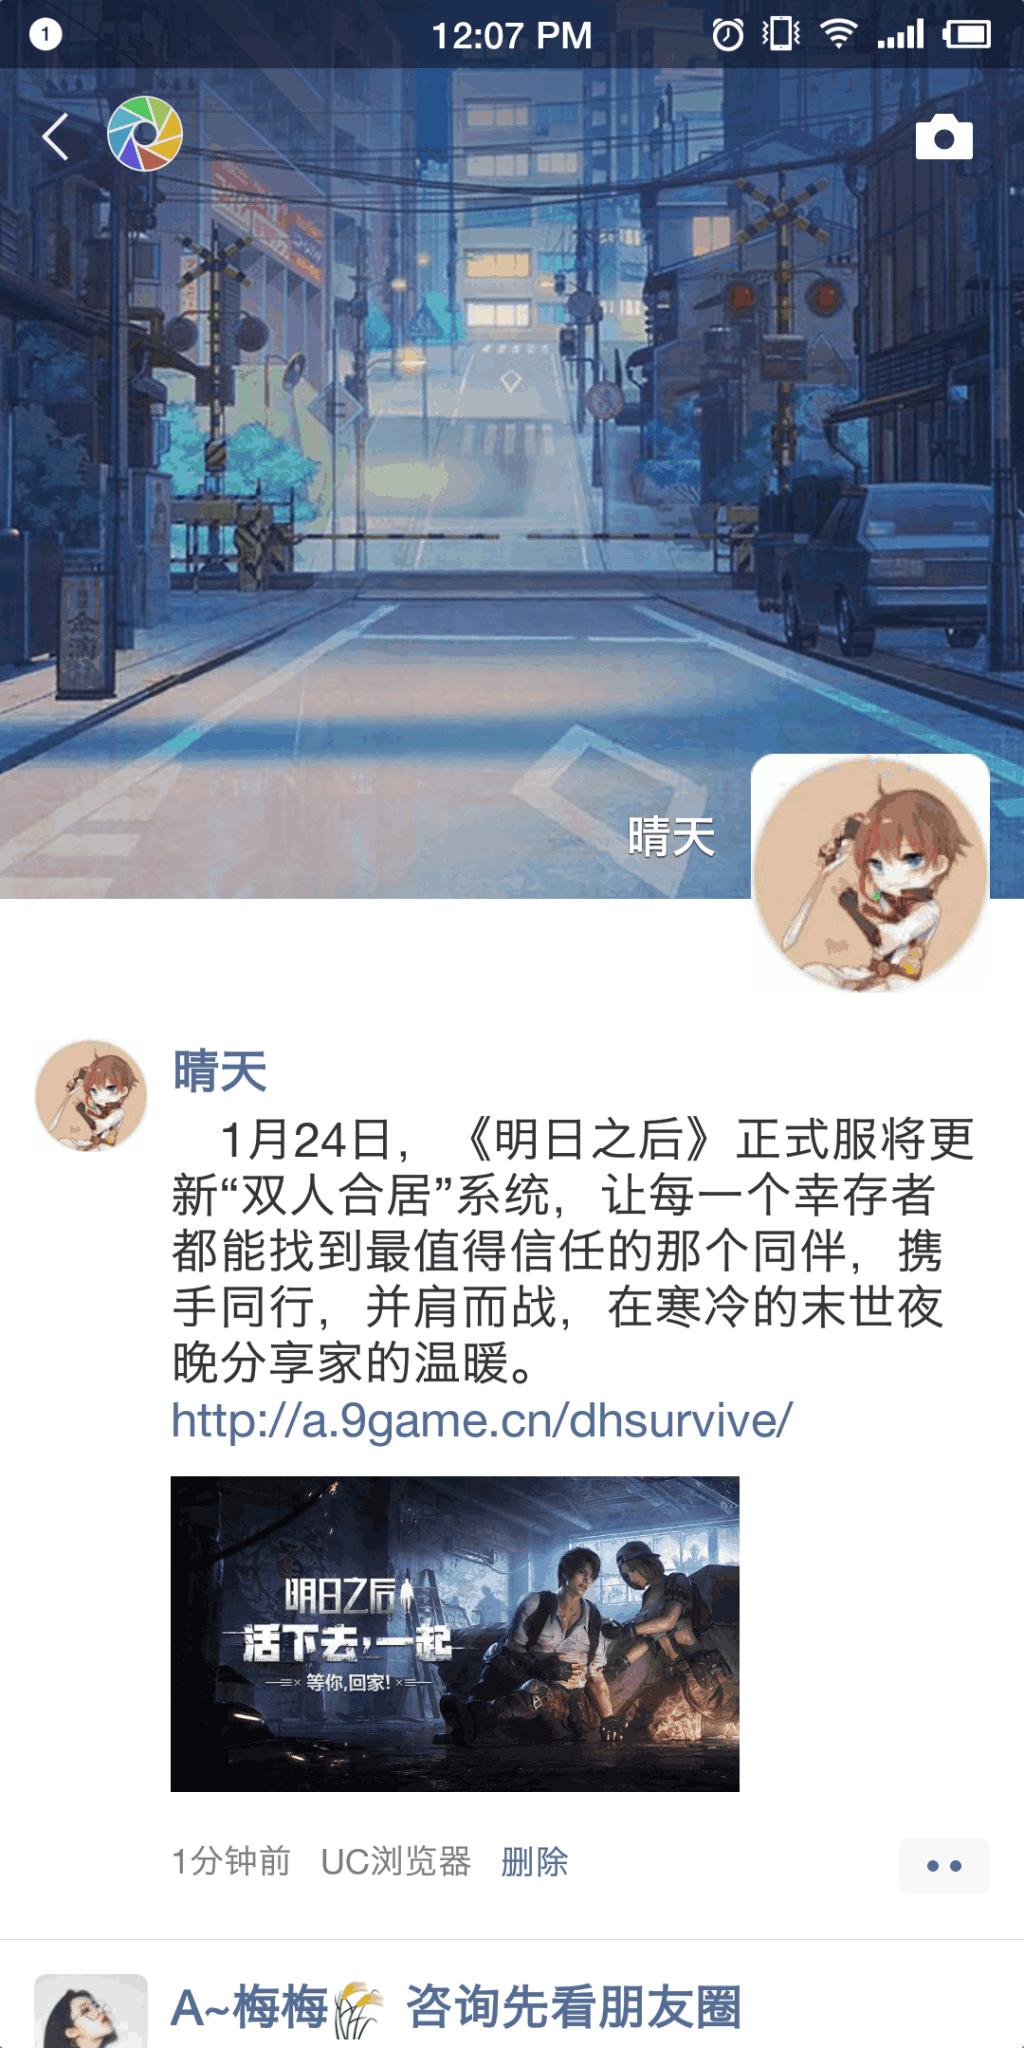 Screenshot_2019s01s18s12s07s15s968_微信.png